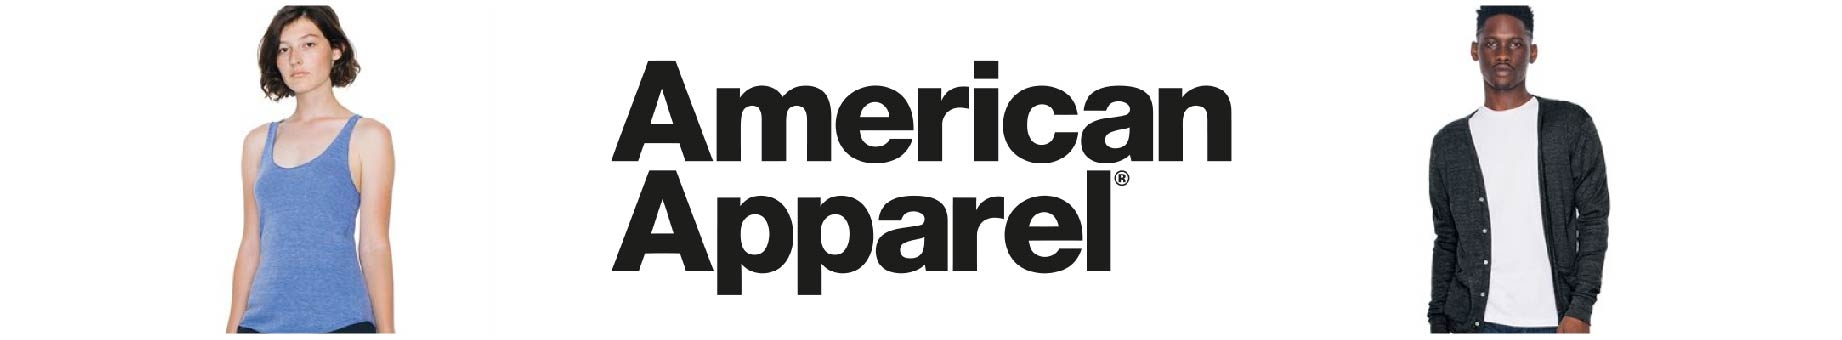 American Apprel